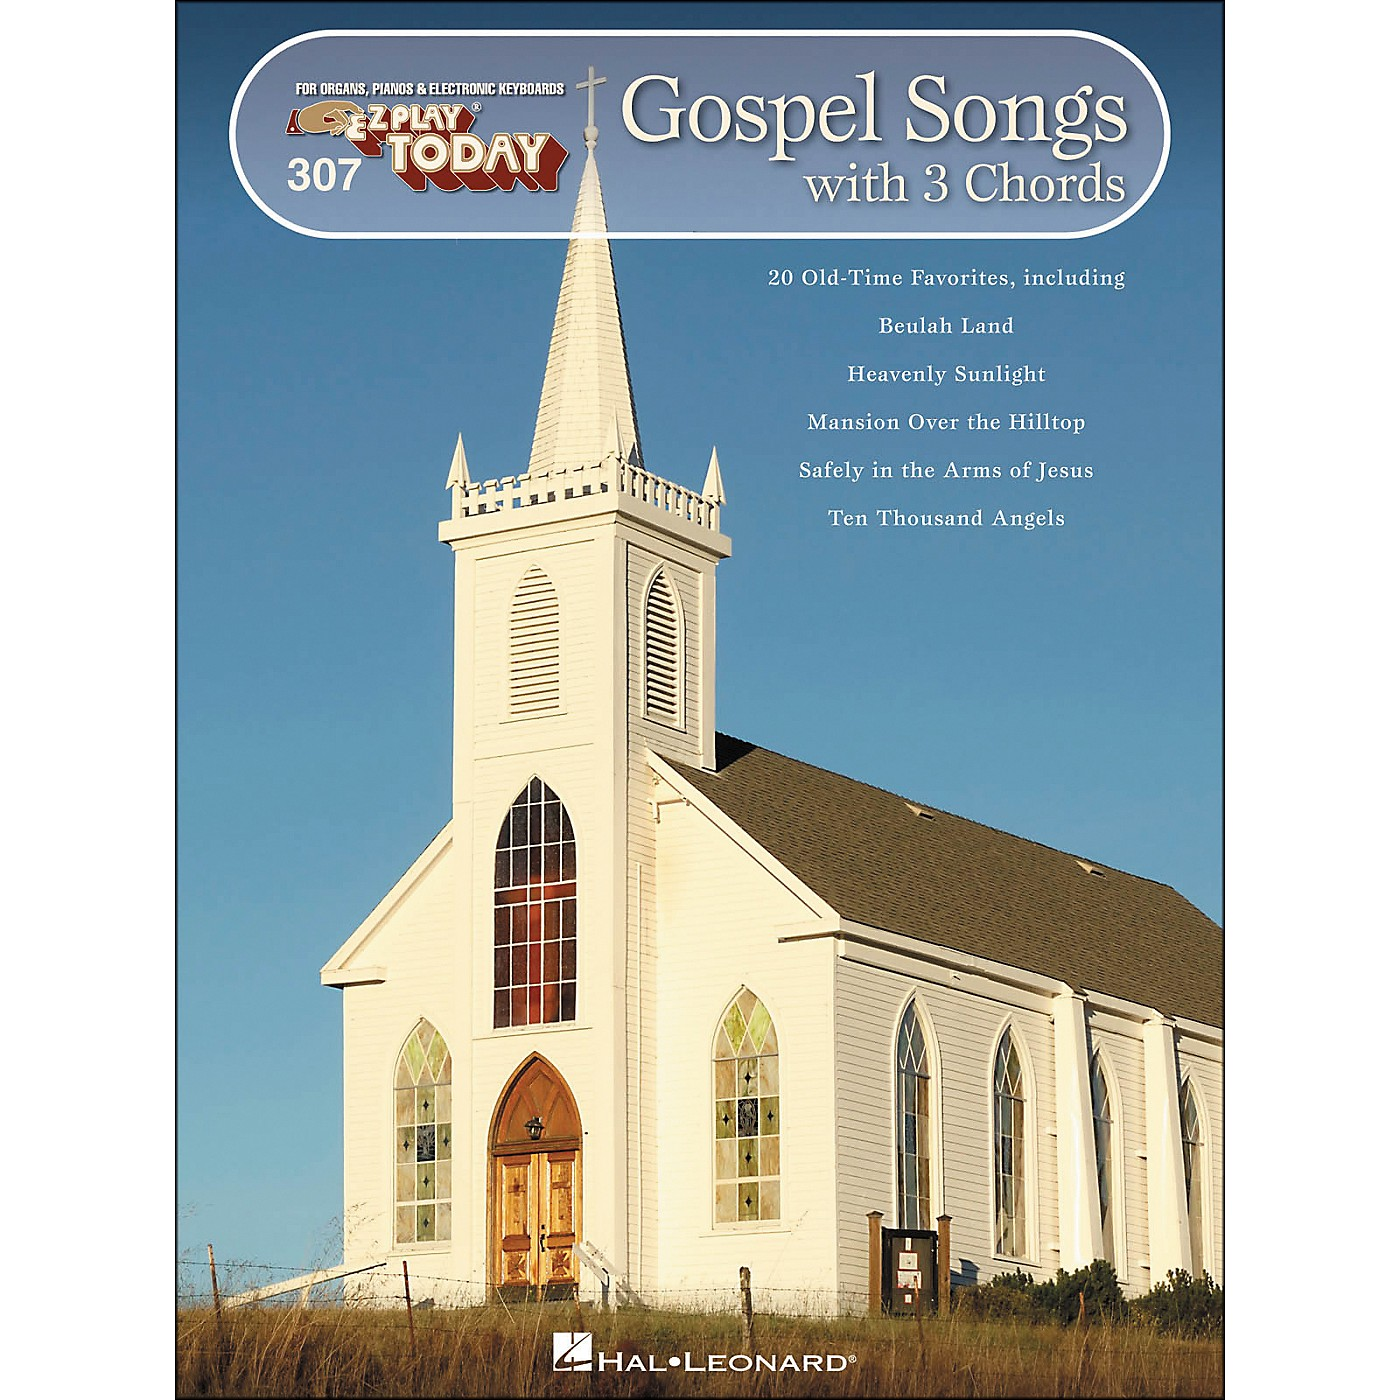 Hal Leonard Gospel Songs with 3 Chords E-Z Play 307 thumbnail